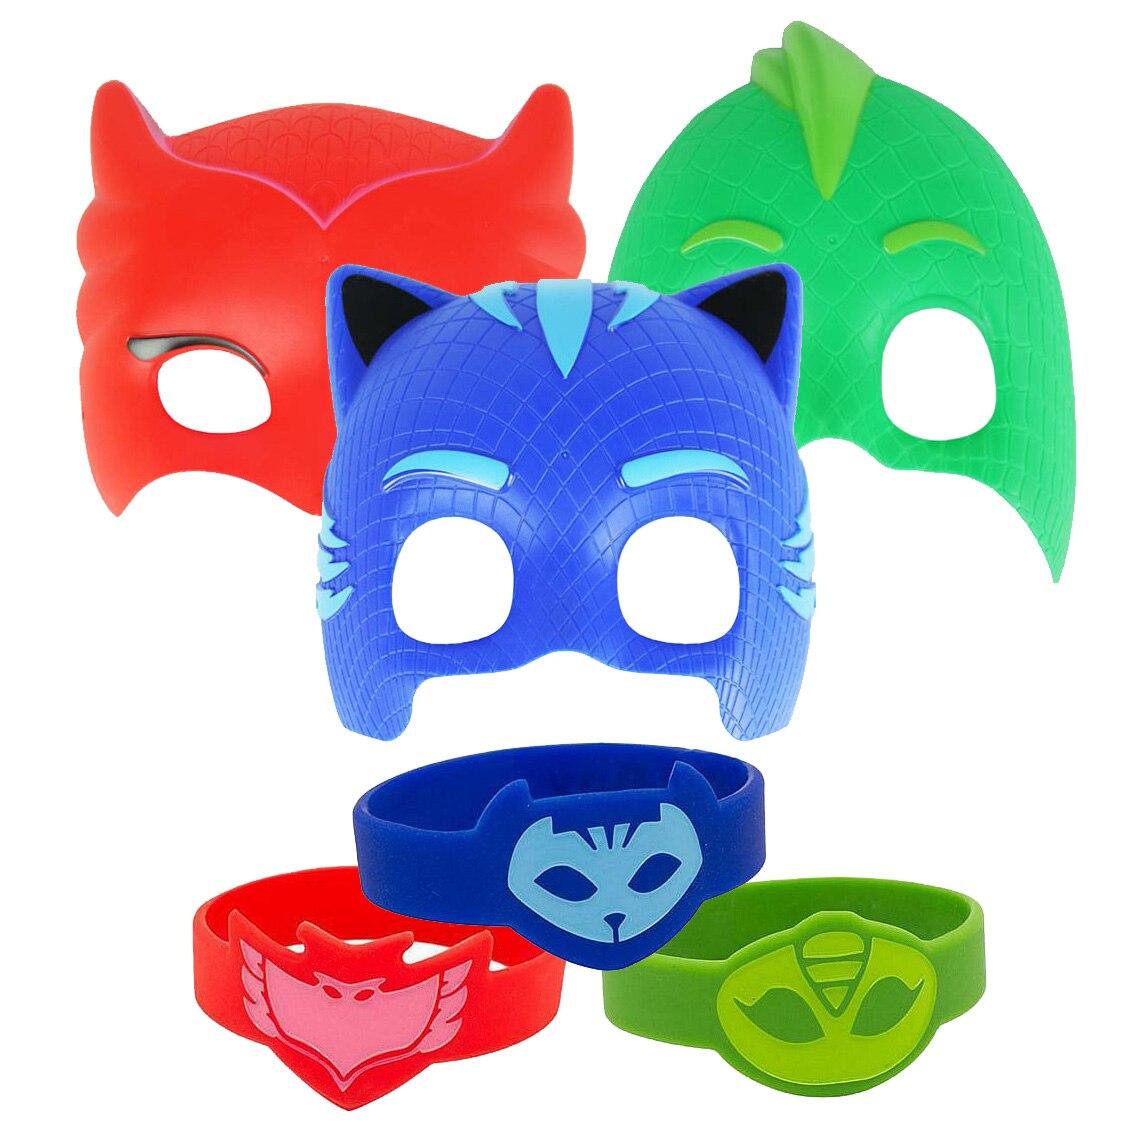 Pj Masks Mask Bracelet Role Playing Christmas Halloween Decoration Anime Doll Toy Cartoon Jewelry Children Gift